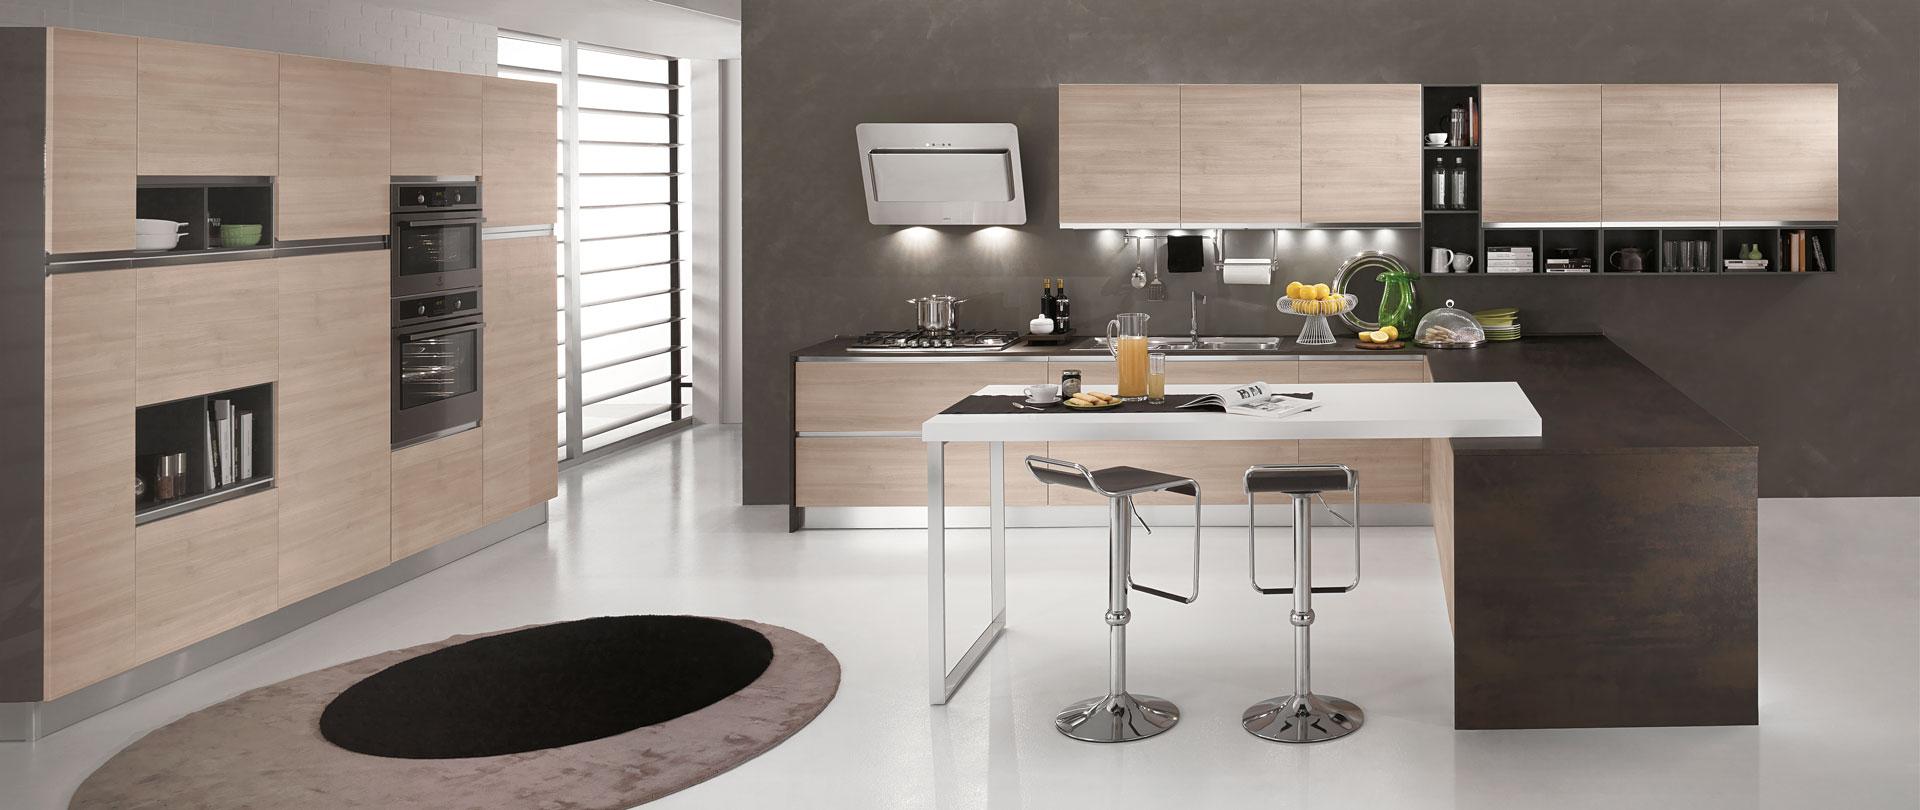 New Meg - Cucina Moderna Mobilturi - Arredi 2000